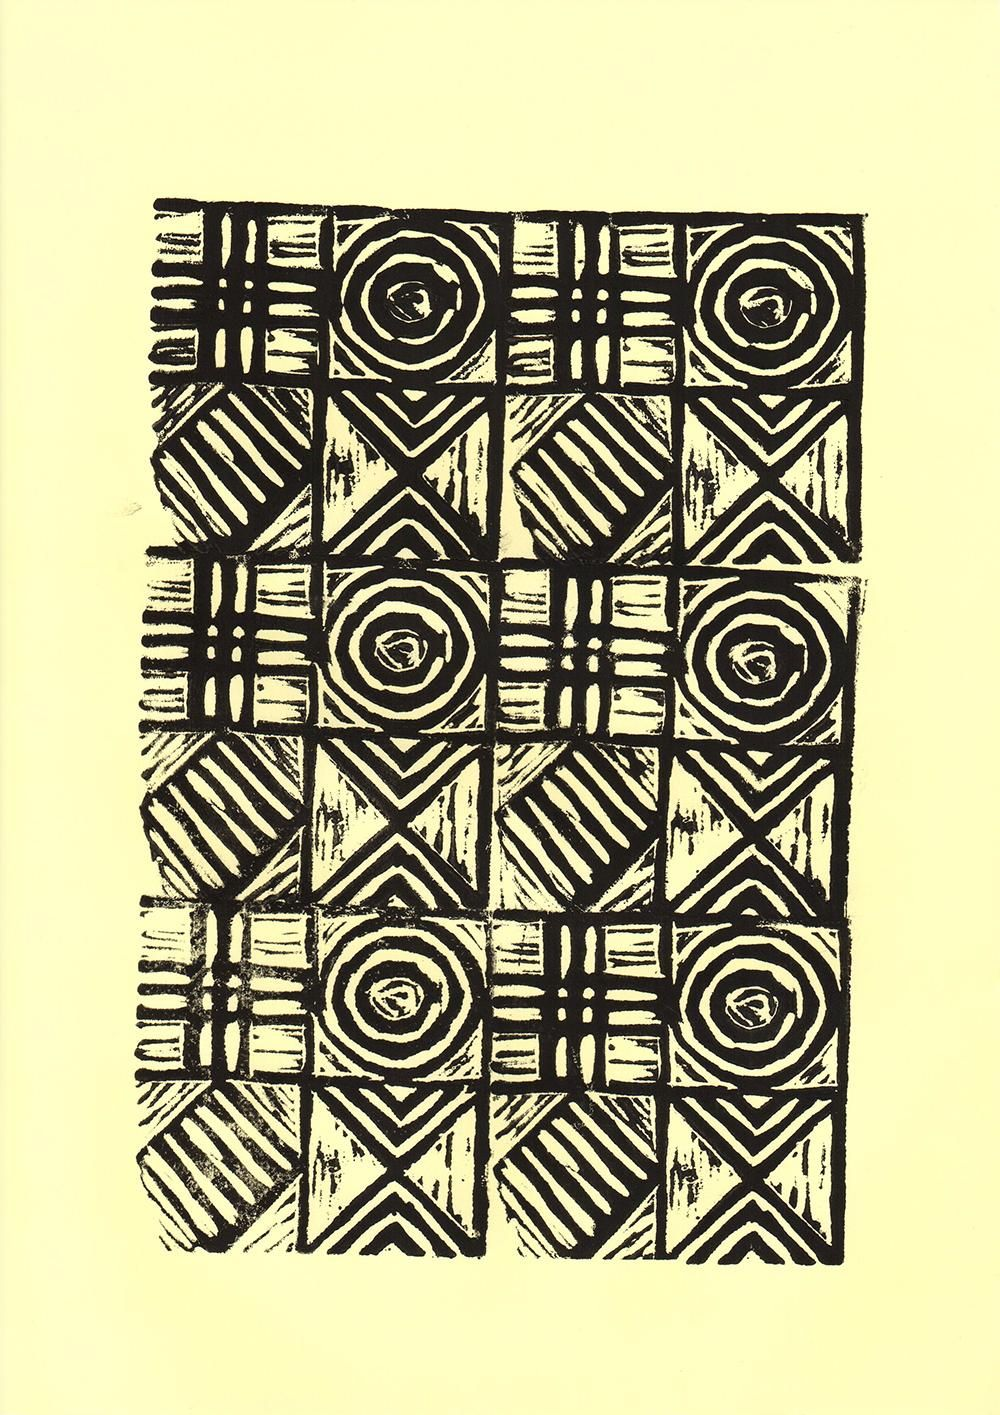 Geometric Linocut Patterns - image 10 - student project